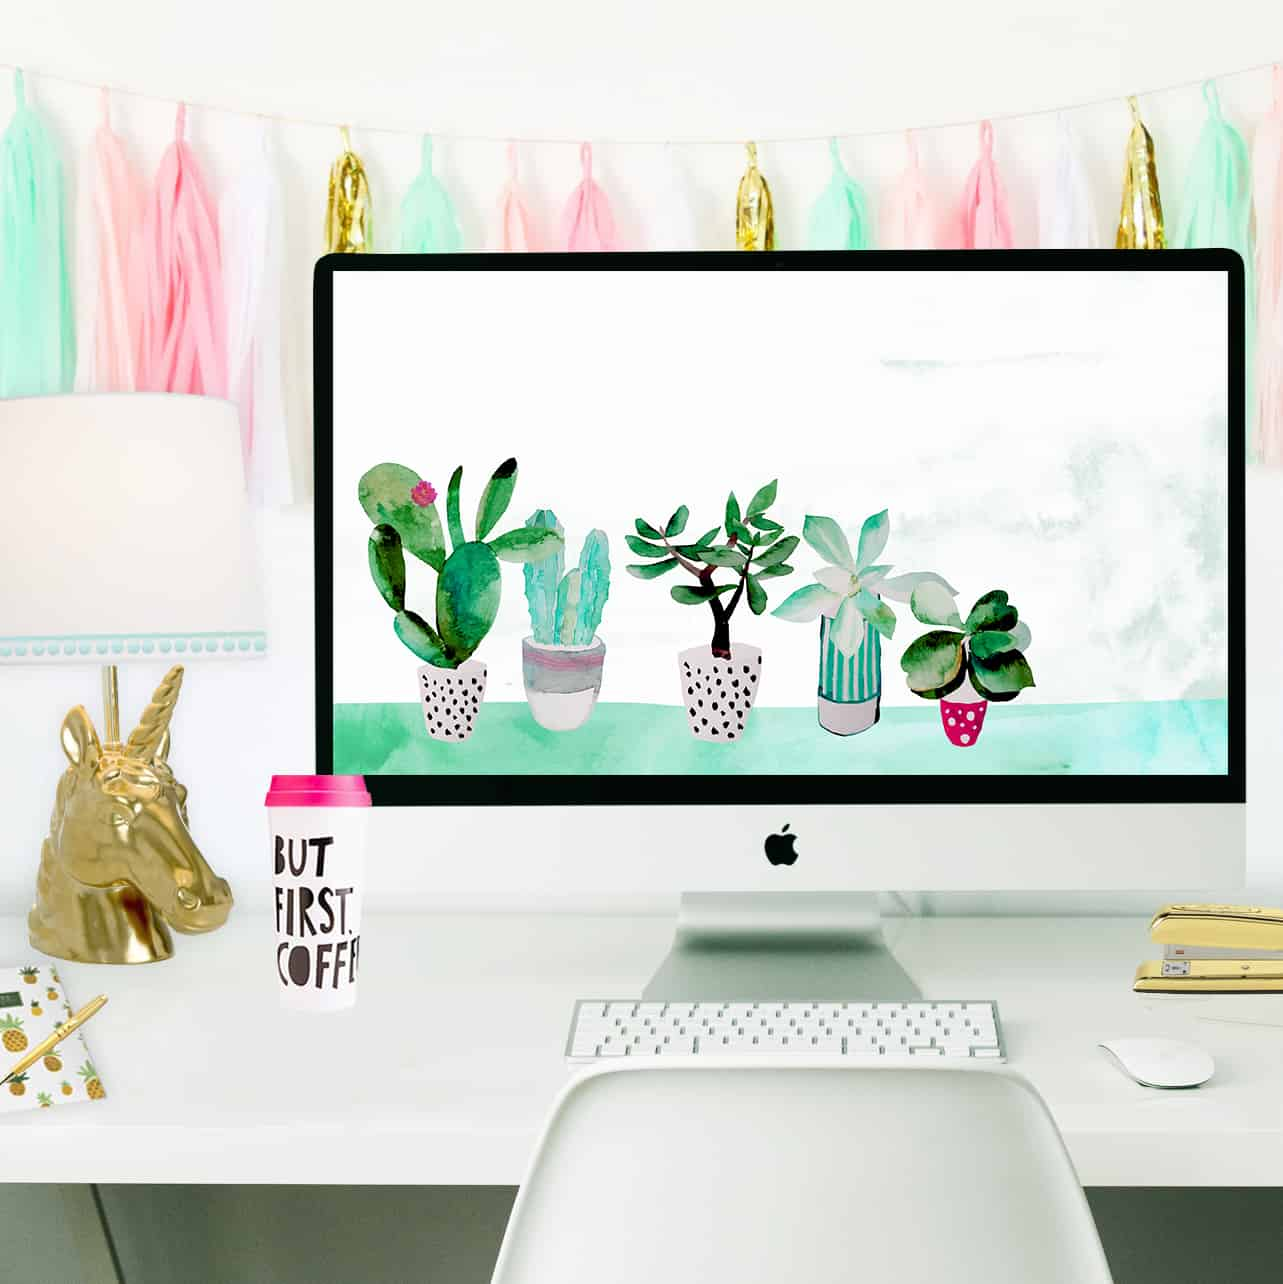 Office Desk Wallpaper: Free Succulent Desktop Wallpaper To Pretty Up Your Desk Space